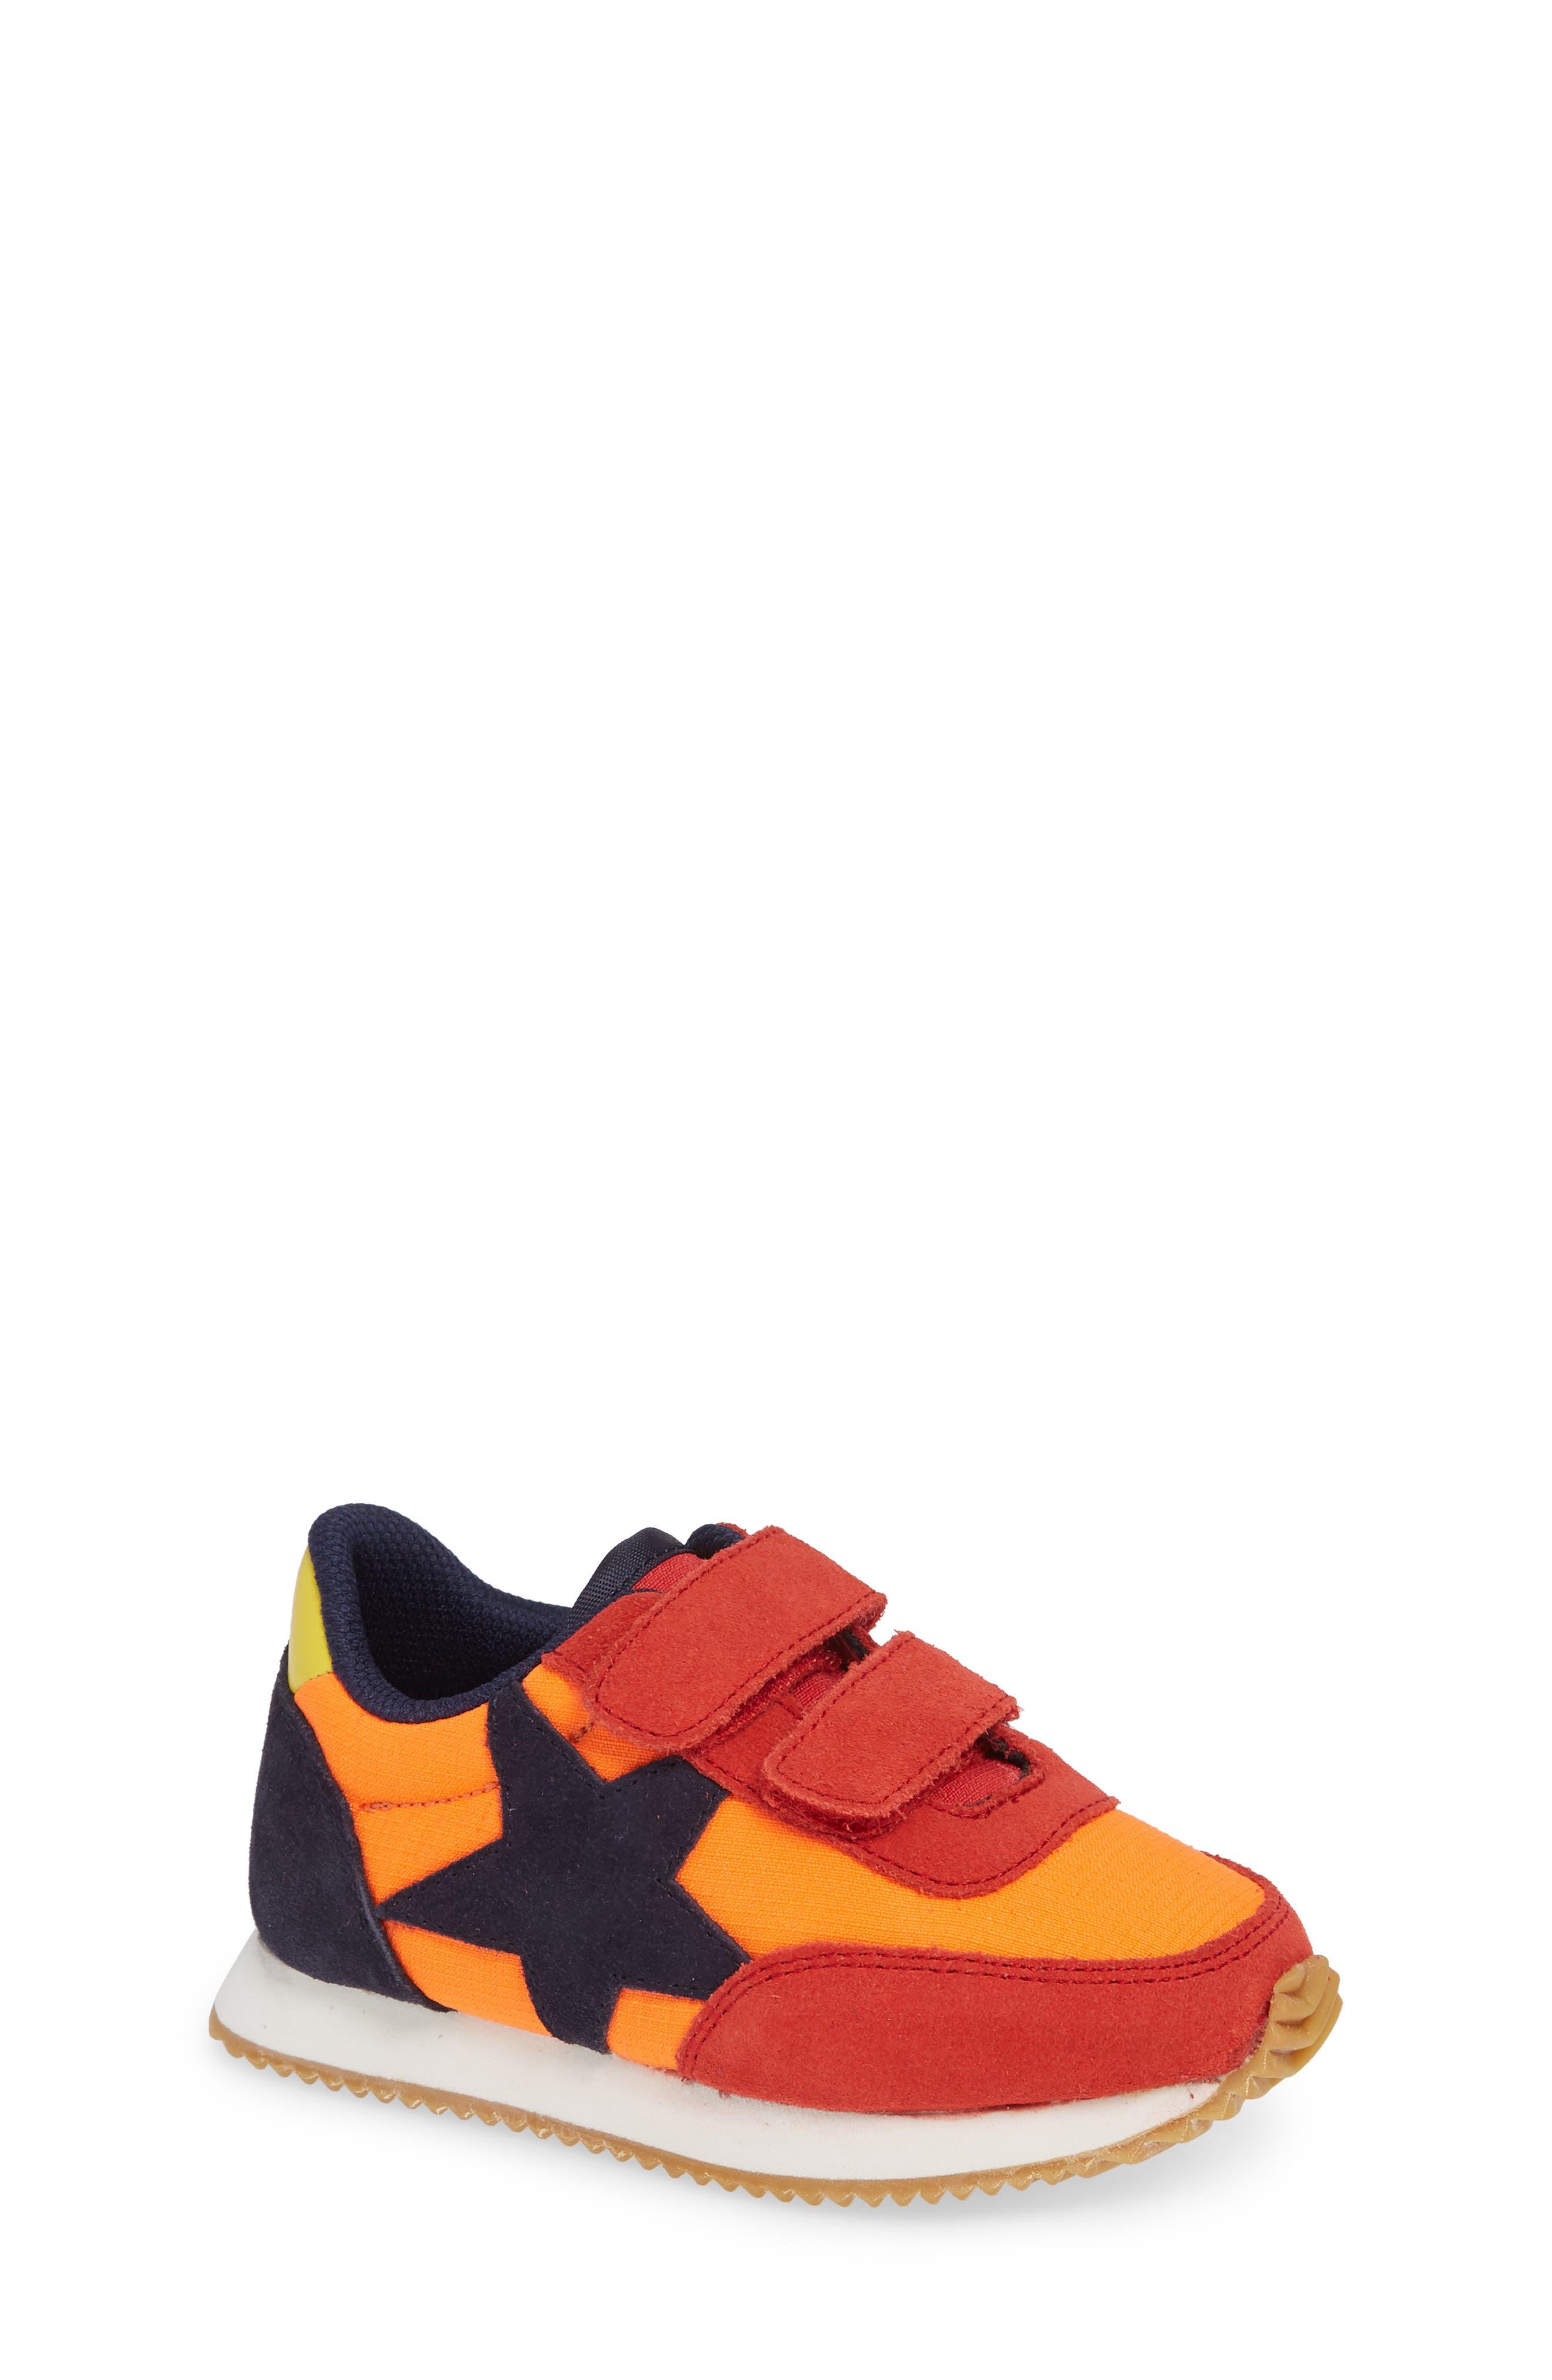 Print Sneakers,                         Main,                         color, SALSA RED